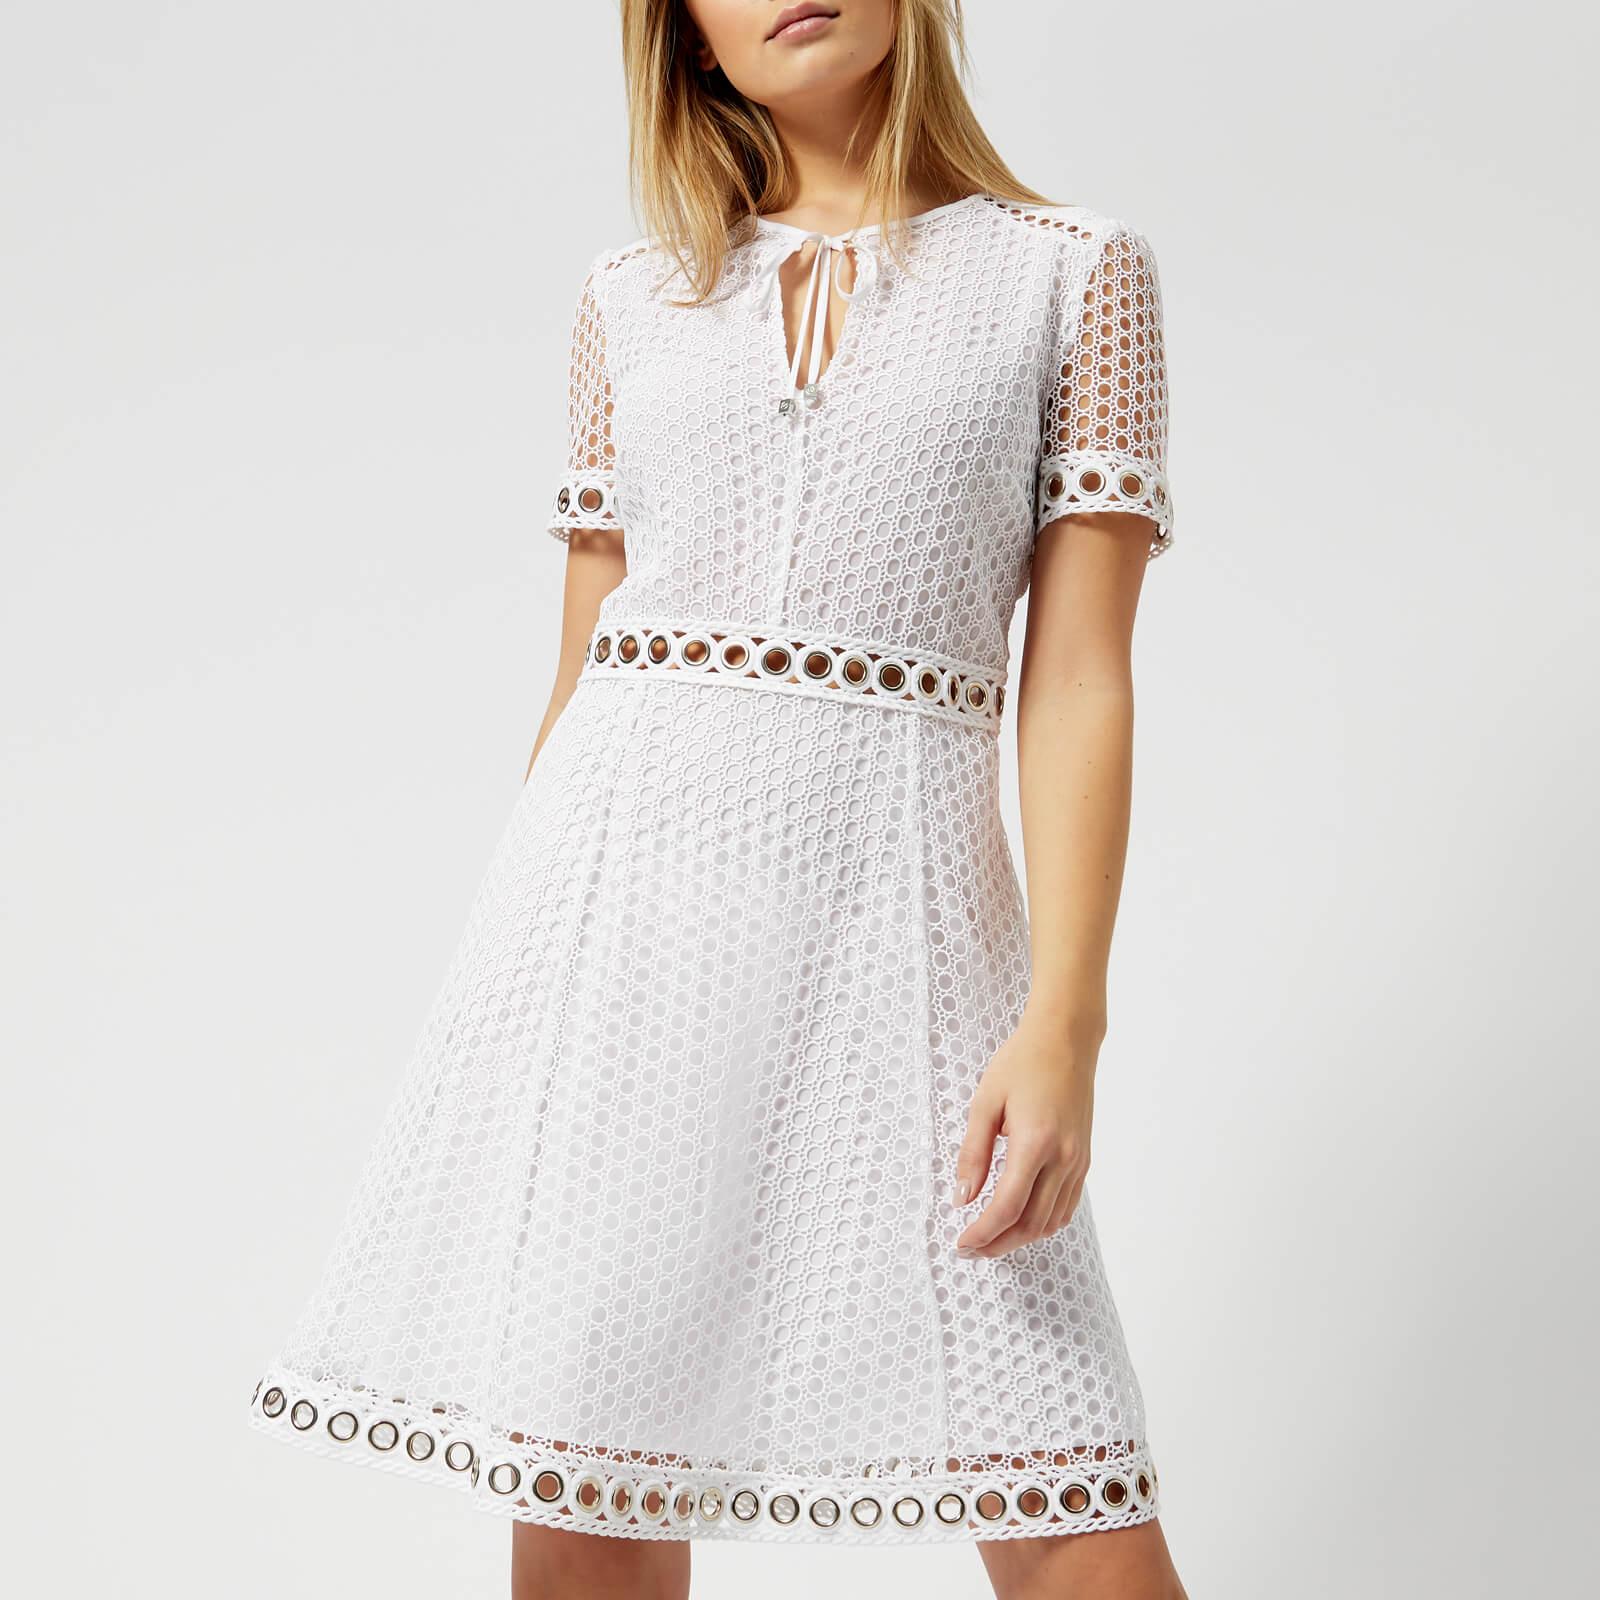 c4b408e0050 MICHAEL MICHAEL KORS Women s Lace Combo Dress - White Womens Clothing